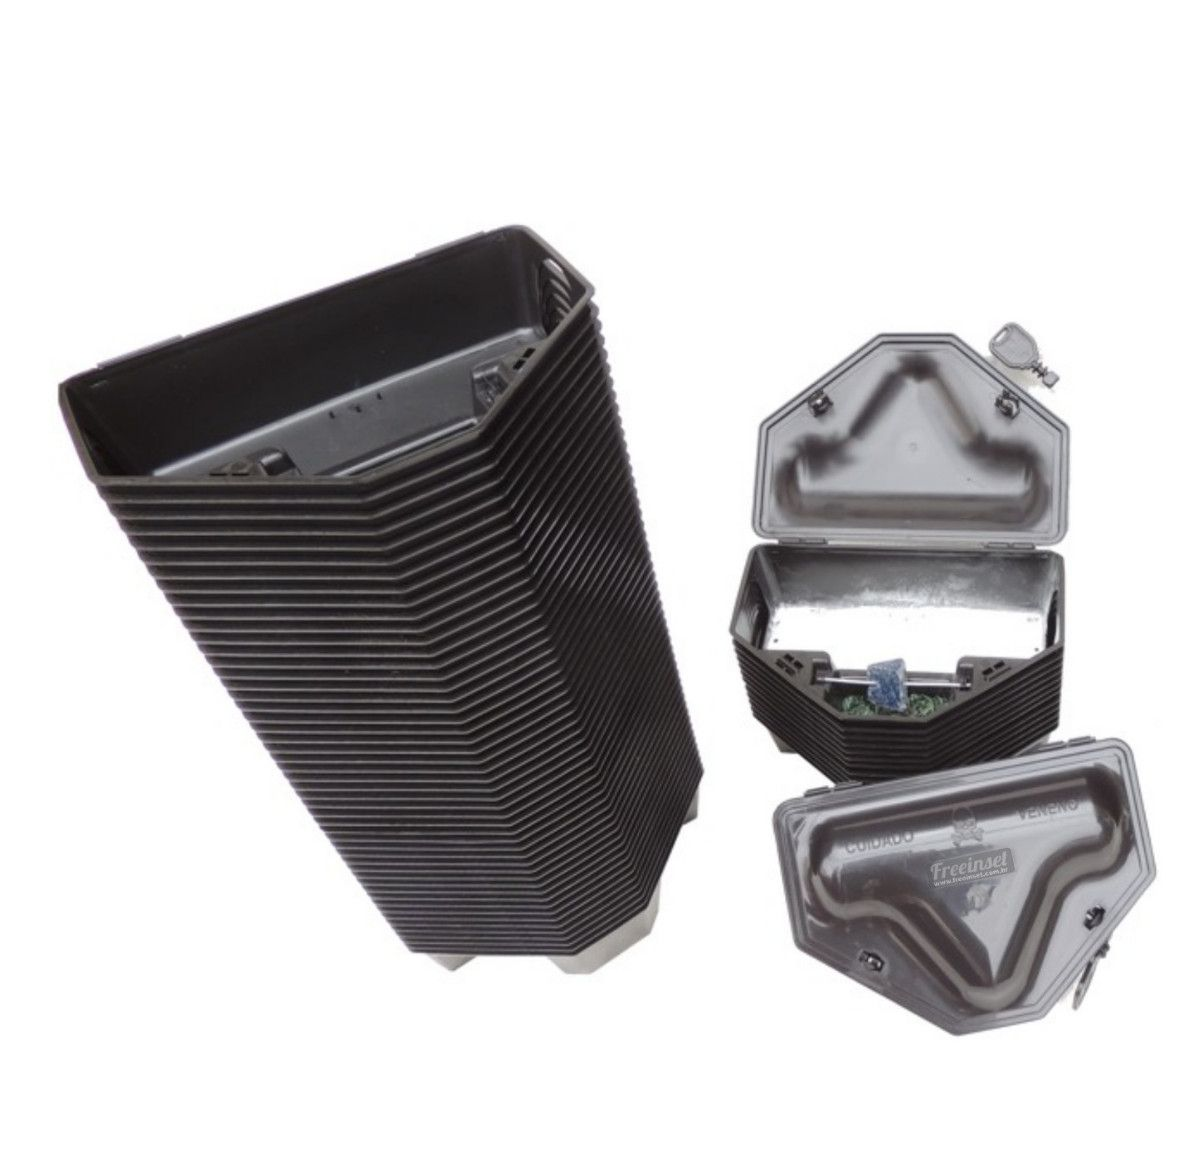 Kit 67 Porta Isca Com 2 Chaves - Duplo Travamento